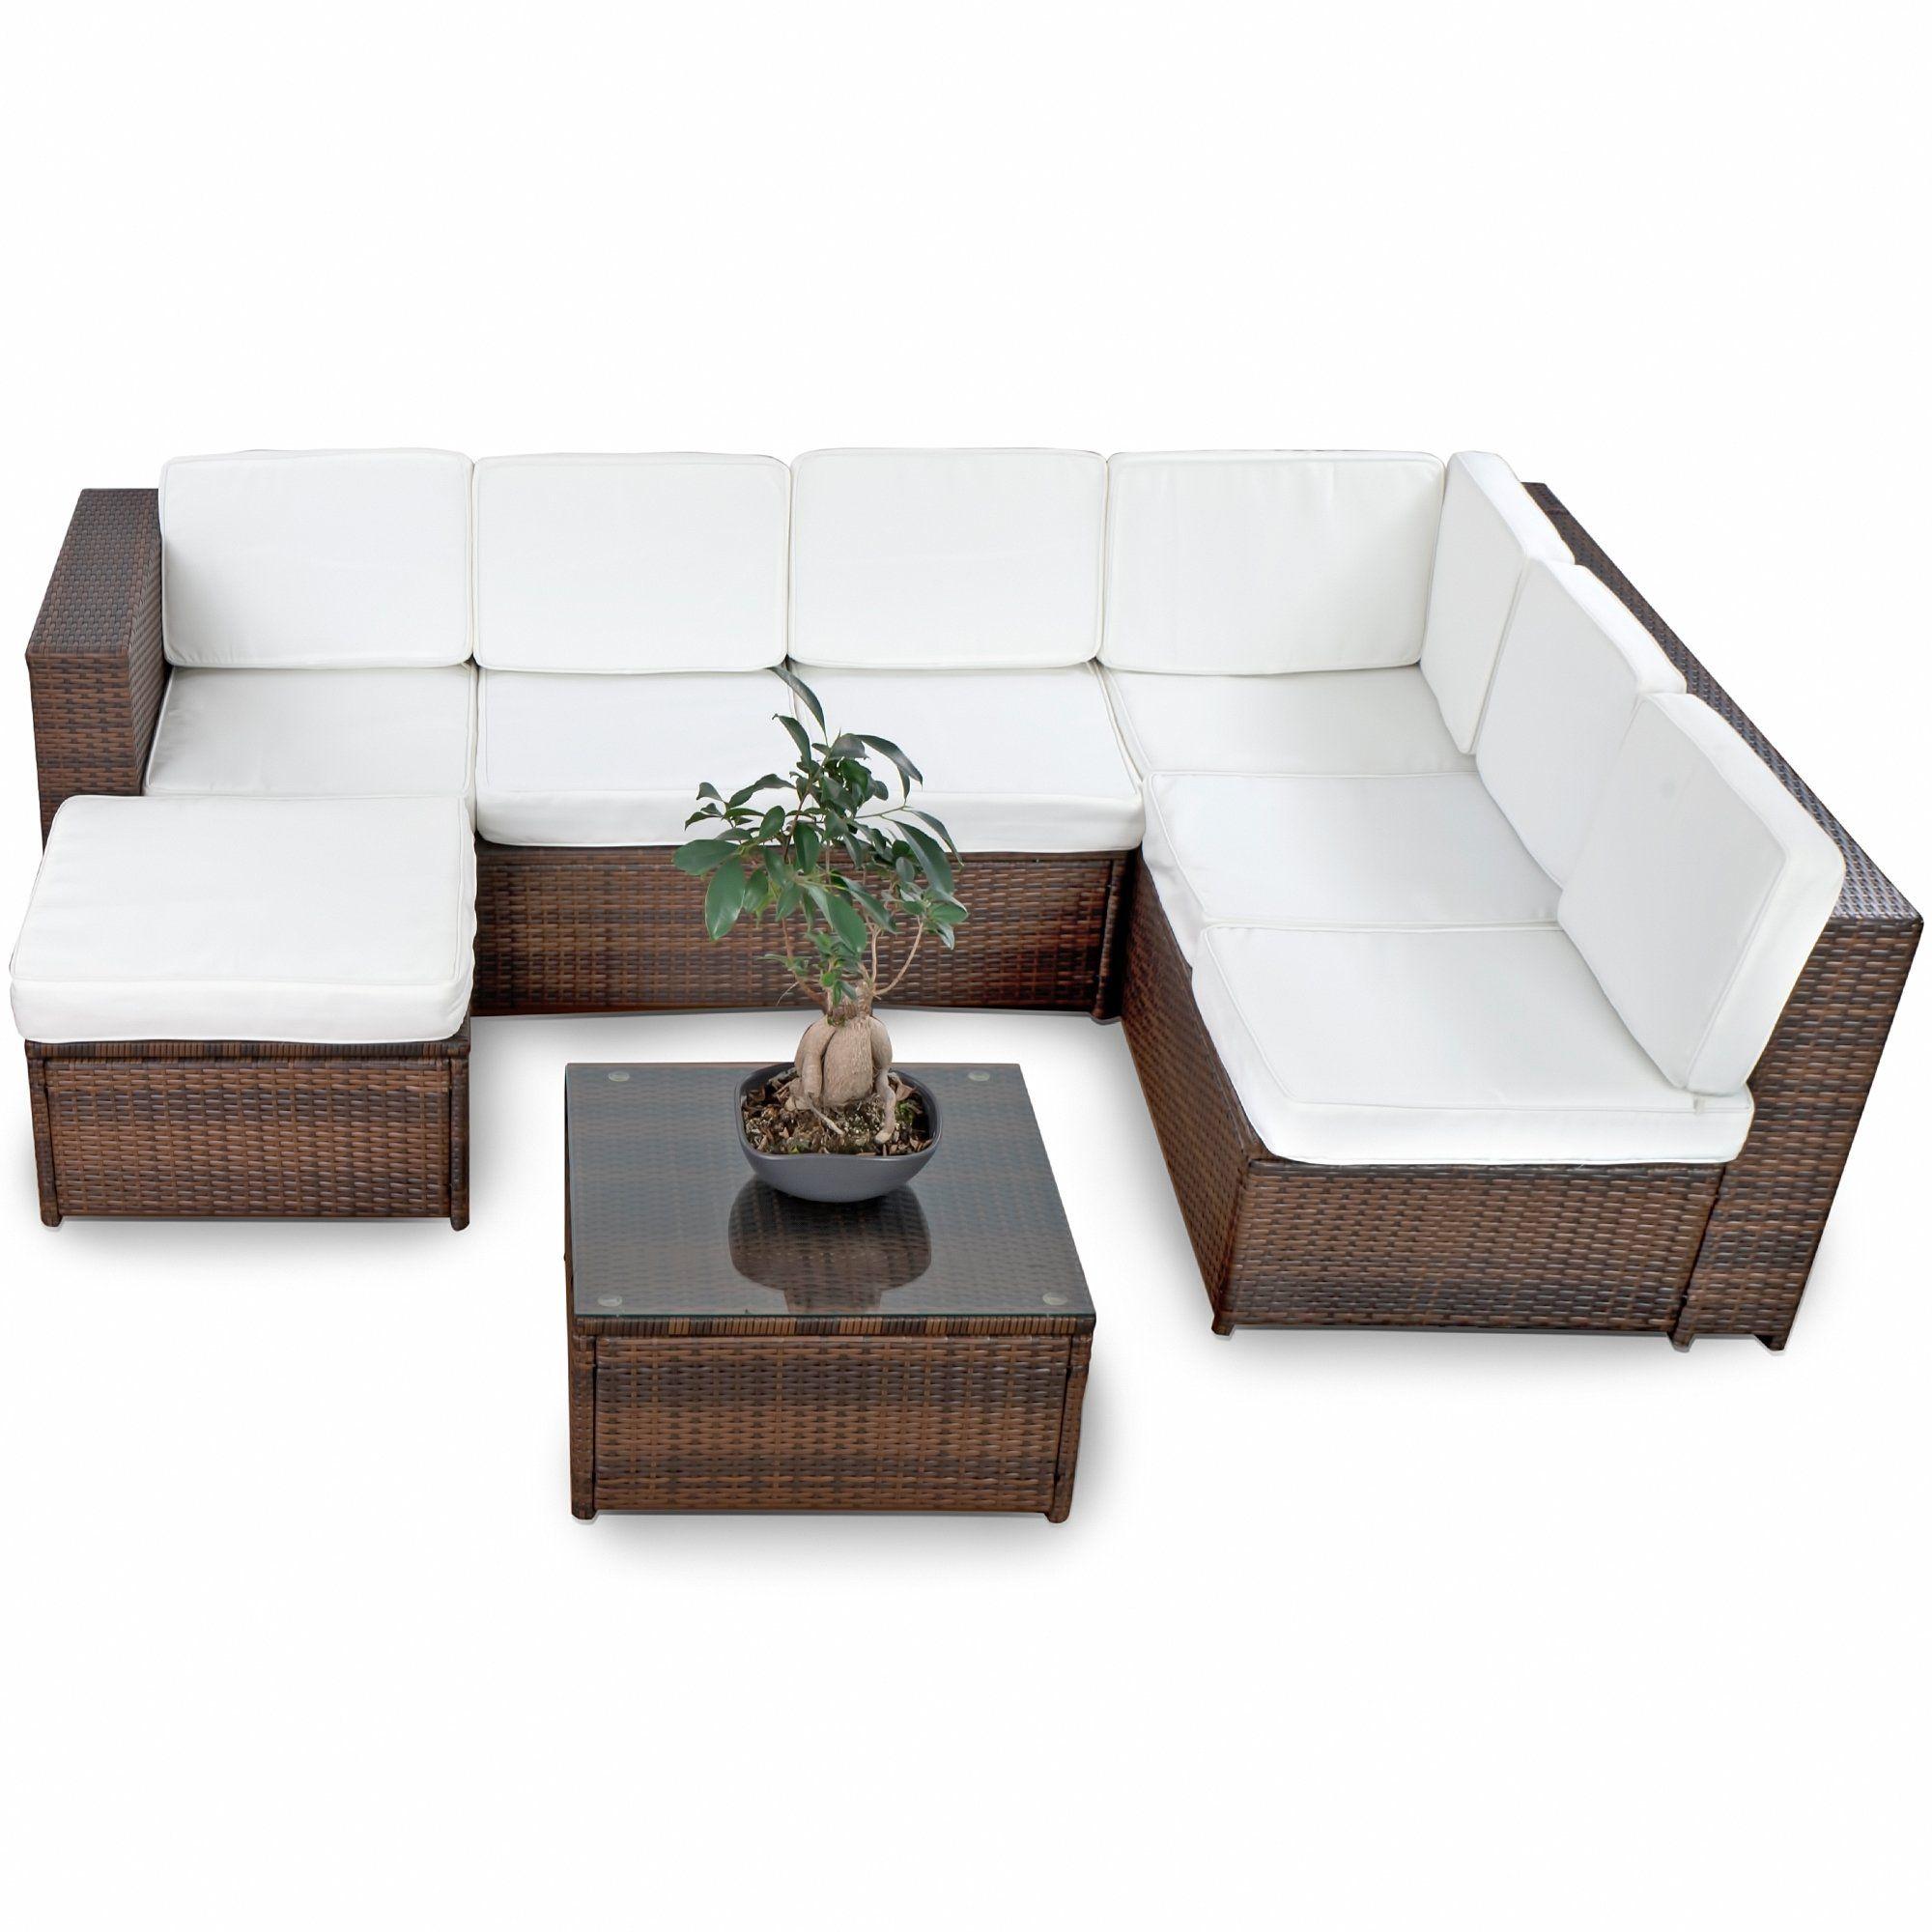 Xinro 19tlg Xxxl Polyrattan Gartenmobel Lounge Sofa Gunstig